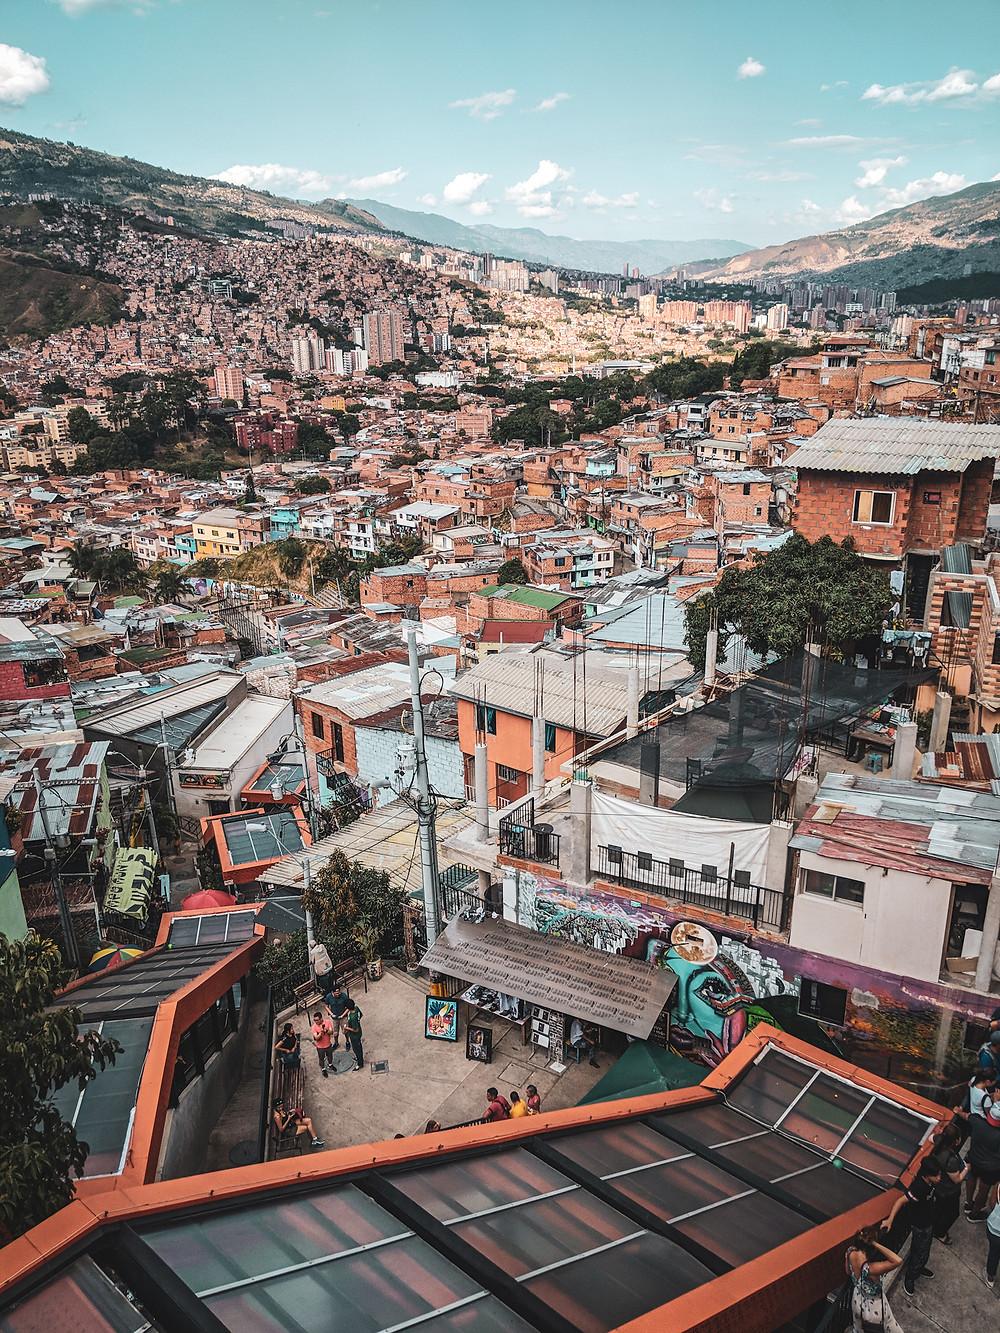 Escalators in Comuna 13.